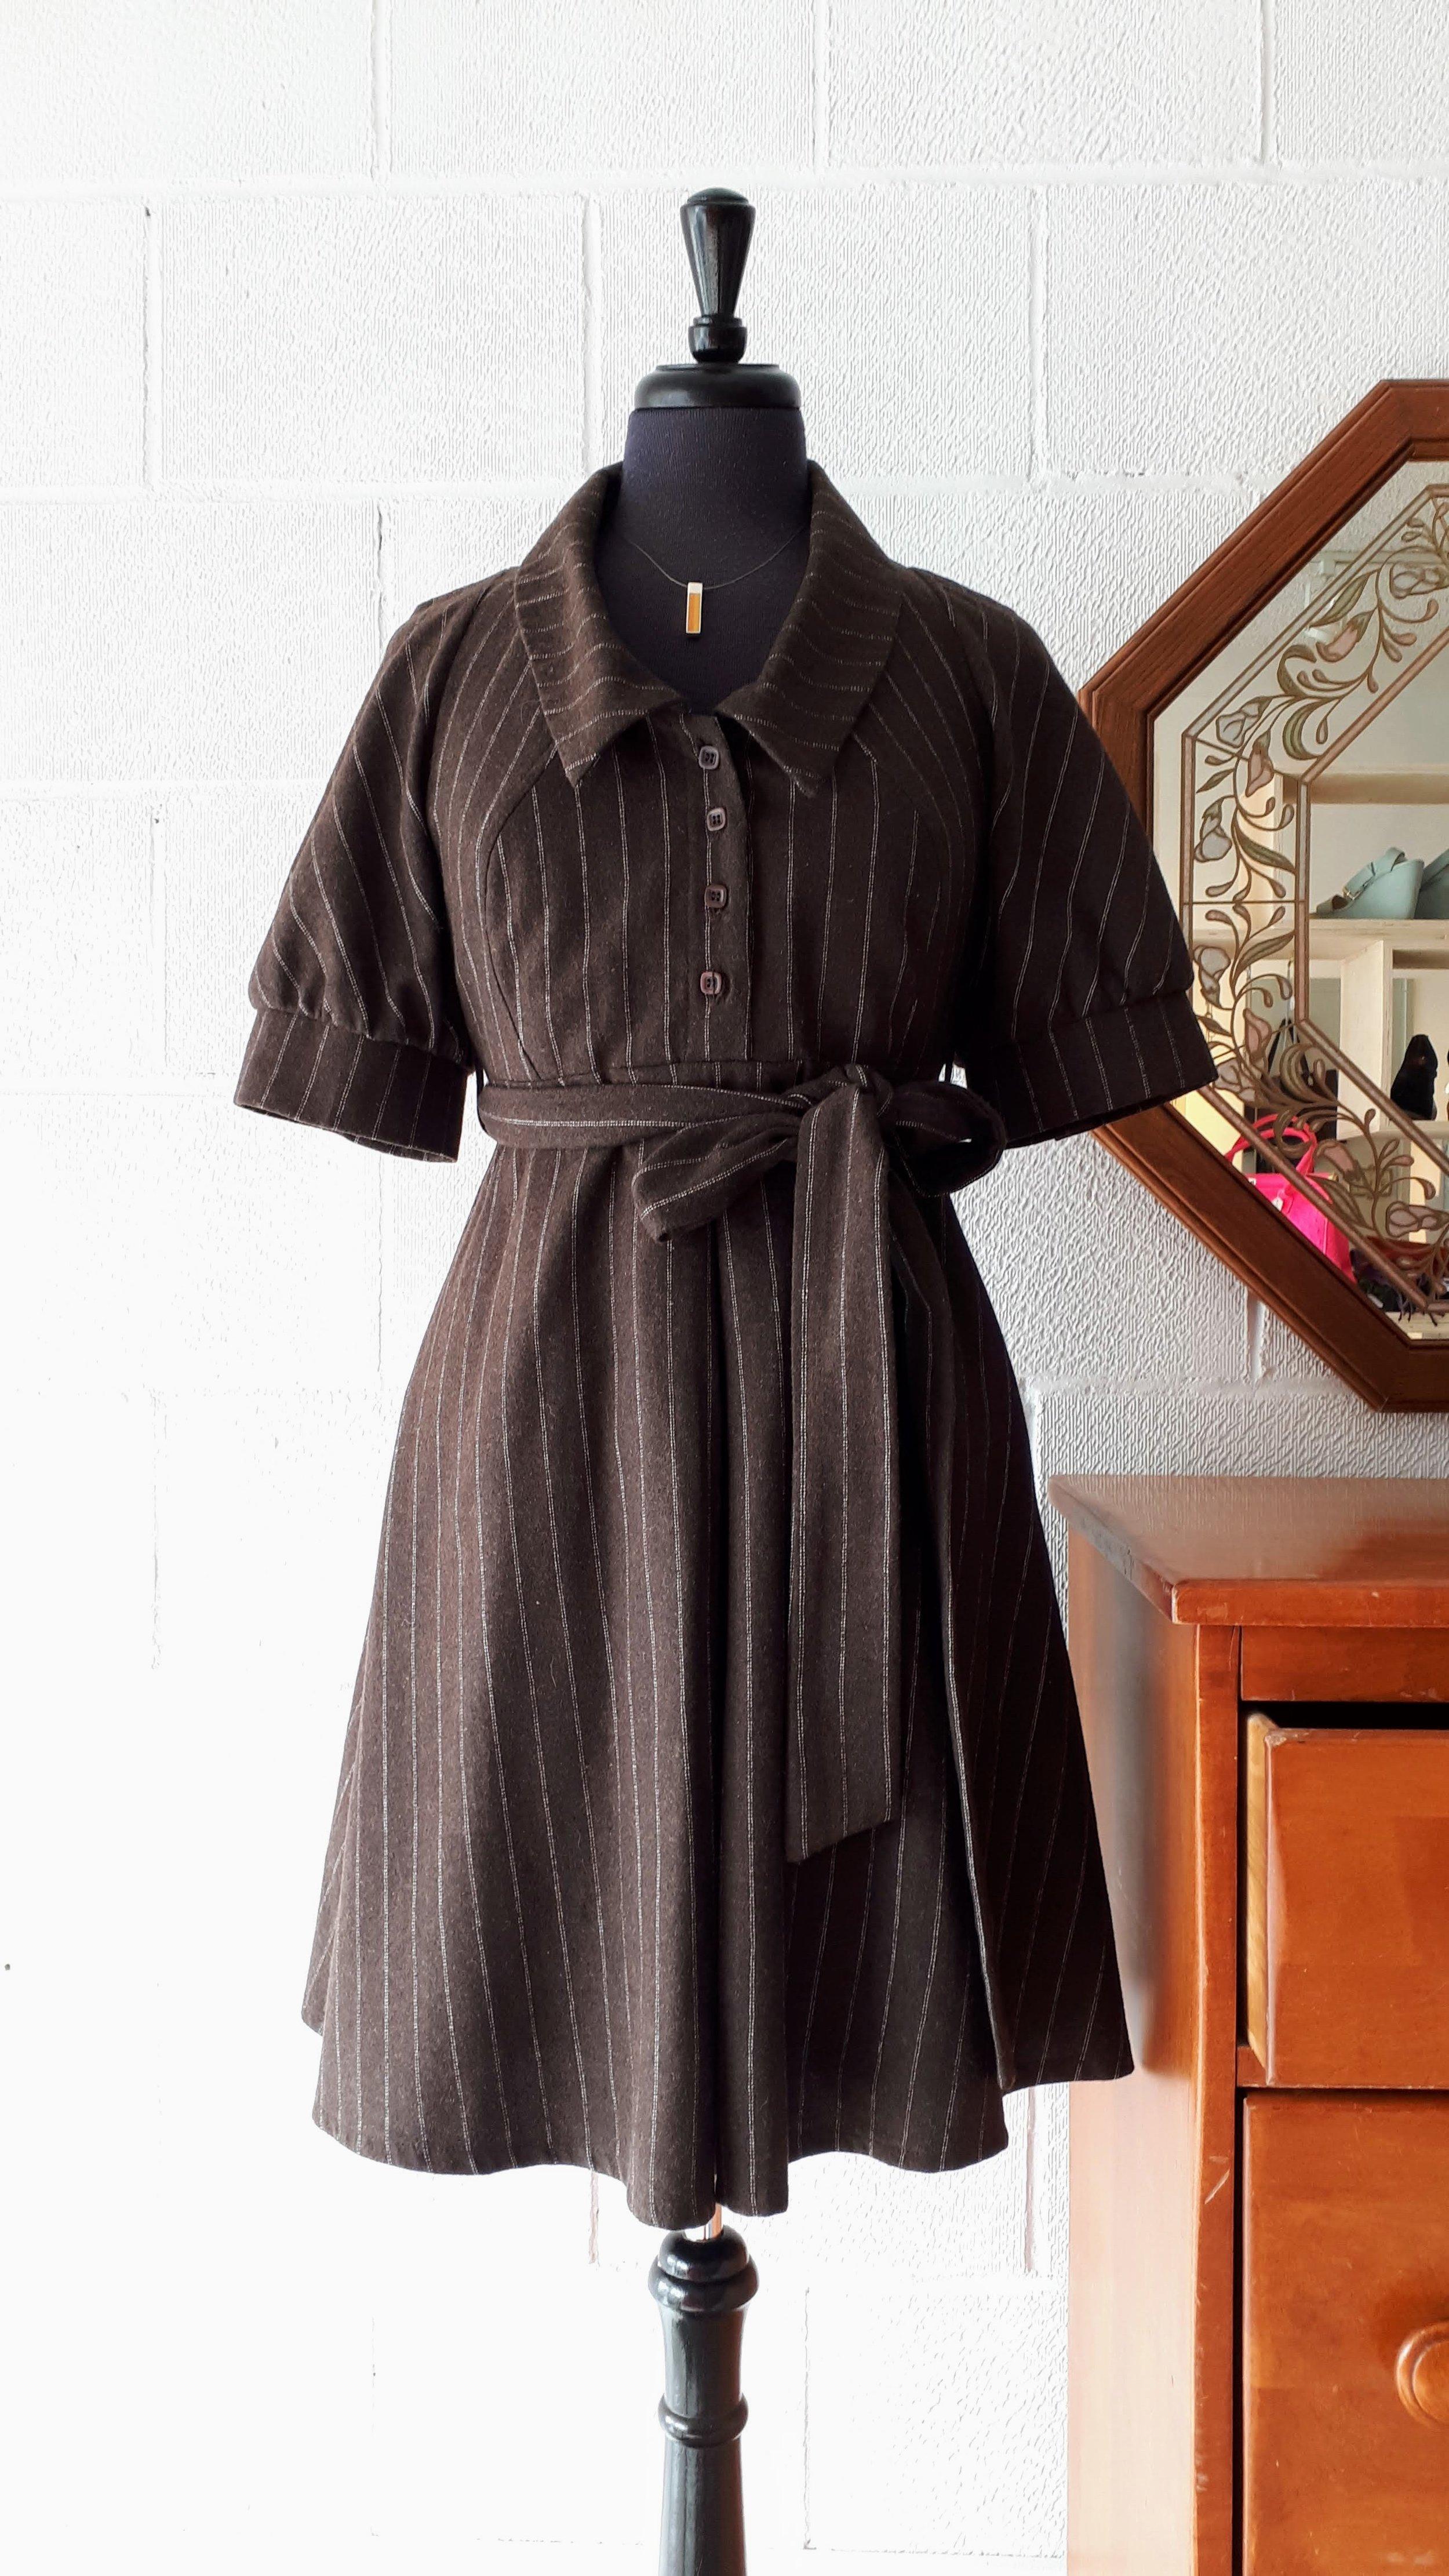 Bodybag by Jude dress; Size M, $45